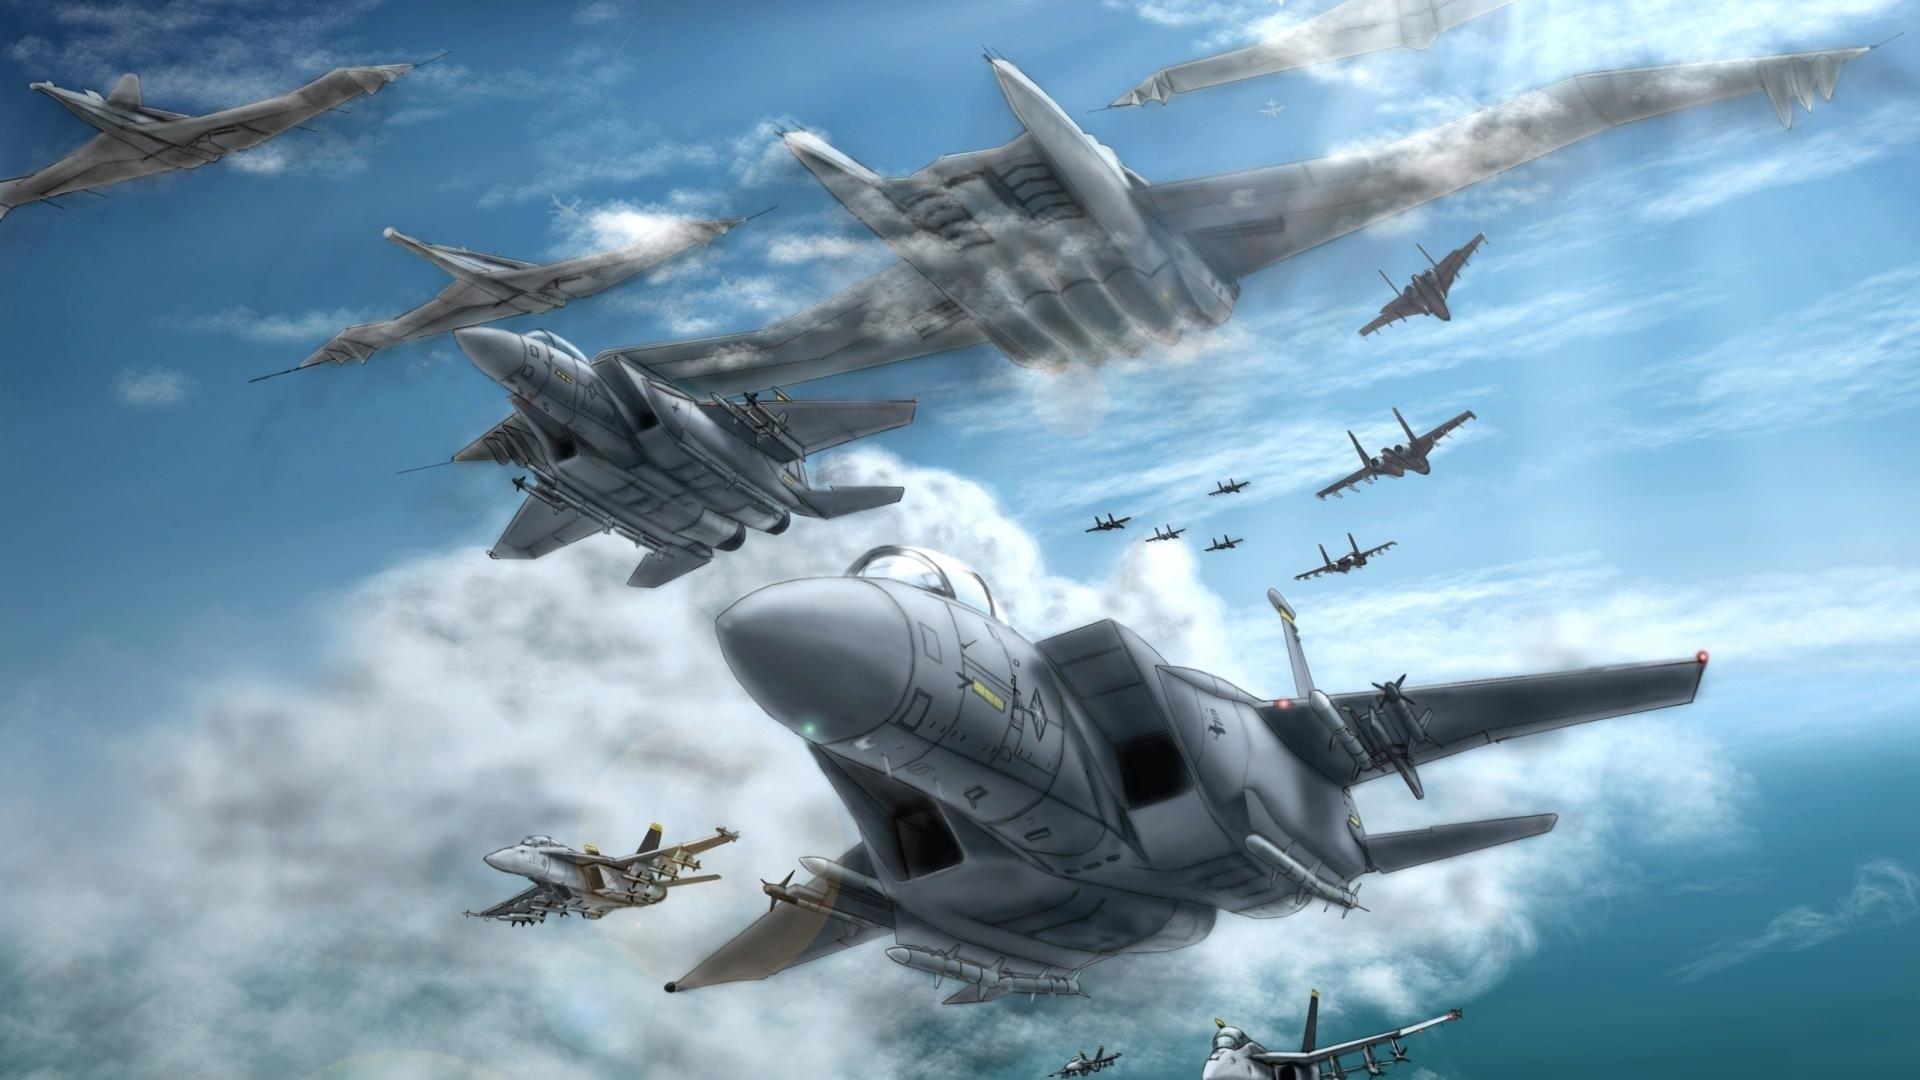 Ace Combat full hd wallpaper for laptop